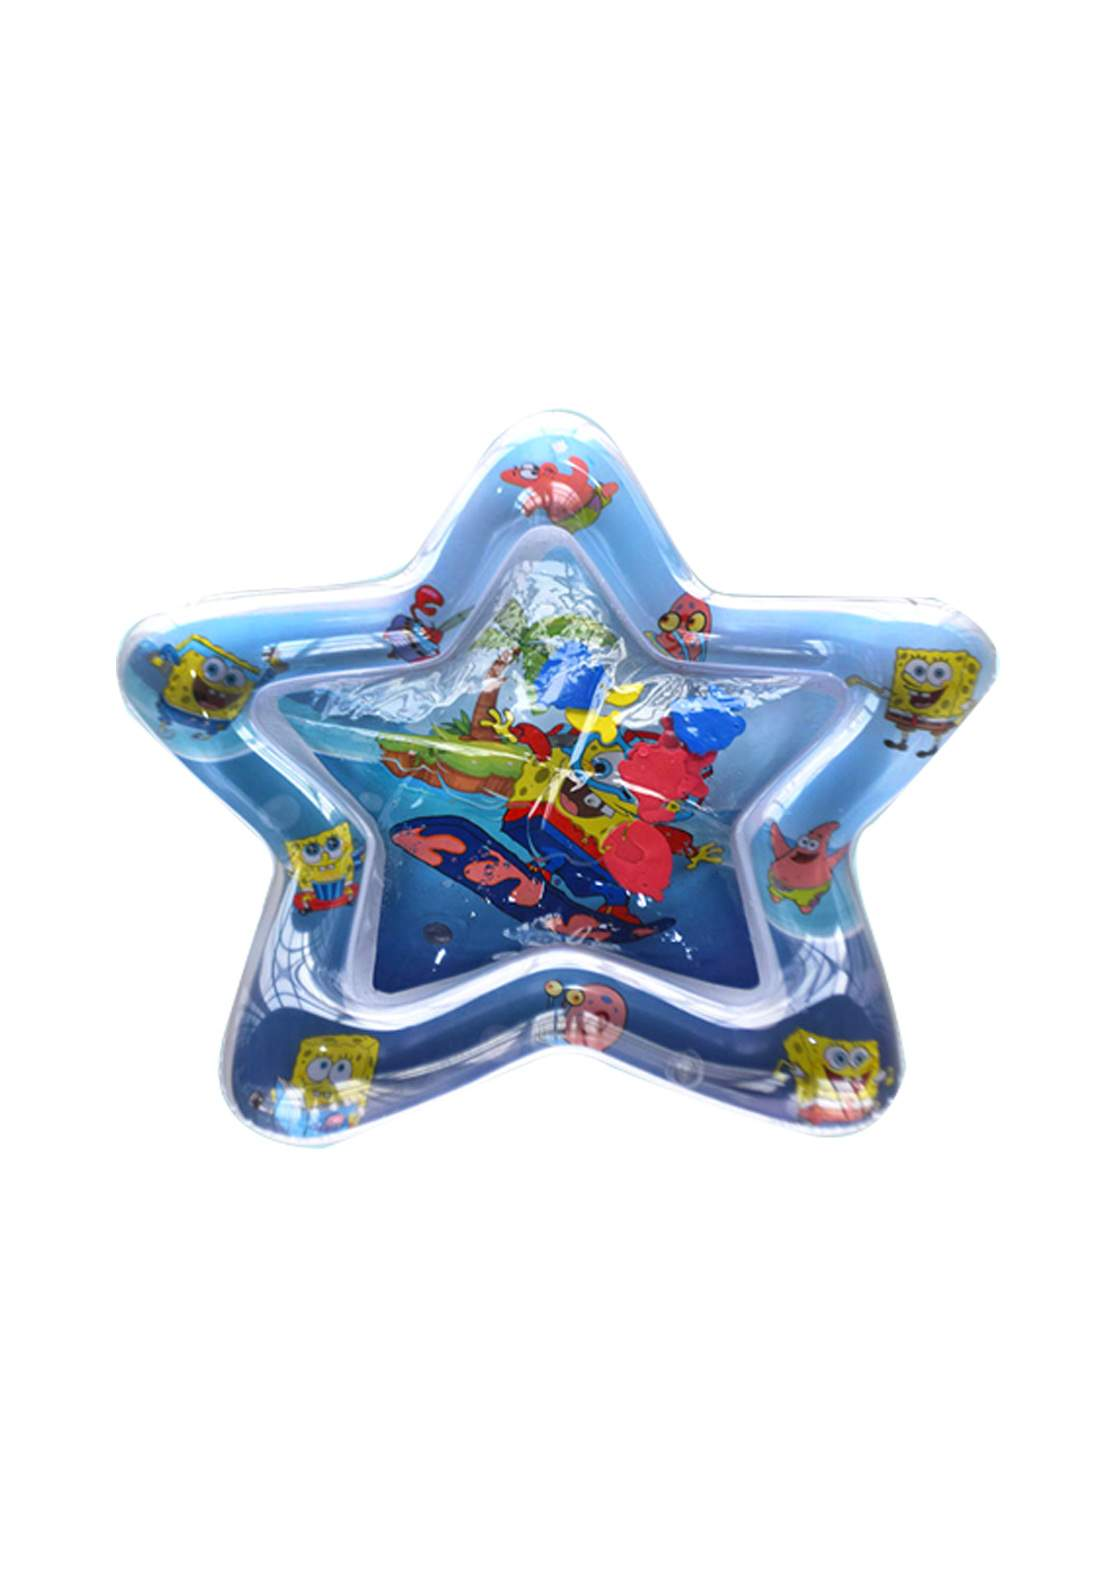 Inflatable Star Water Mat for Kids  حوض مائي للأطفال